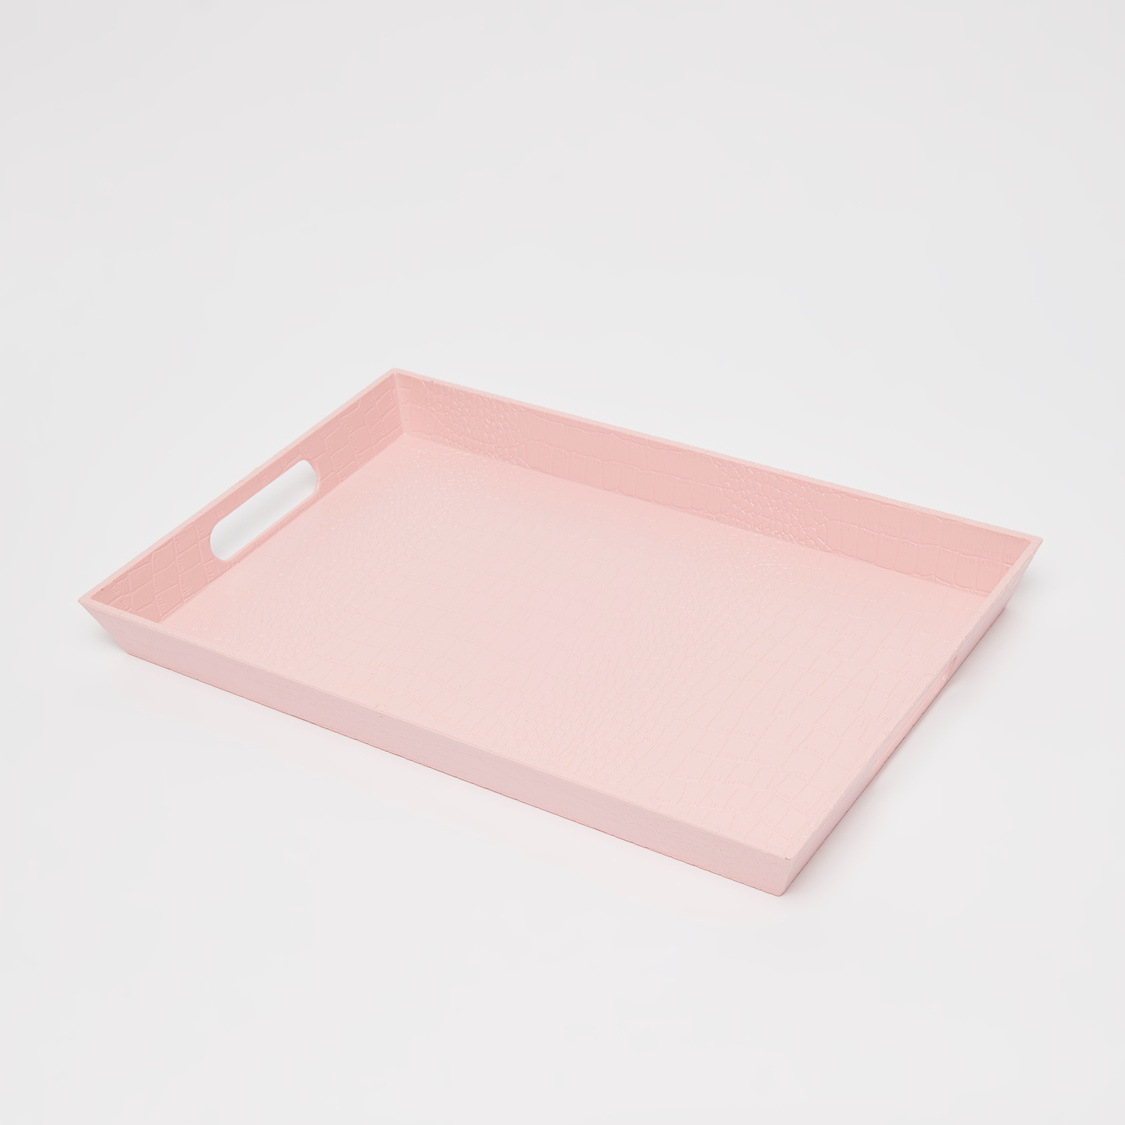 Textured Rectangular Serving Tray with Cutout Handles - 40x27x4 cms